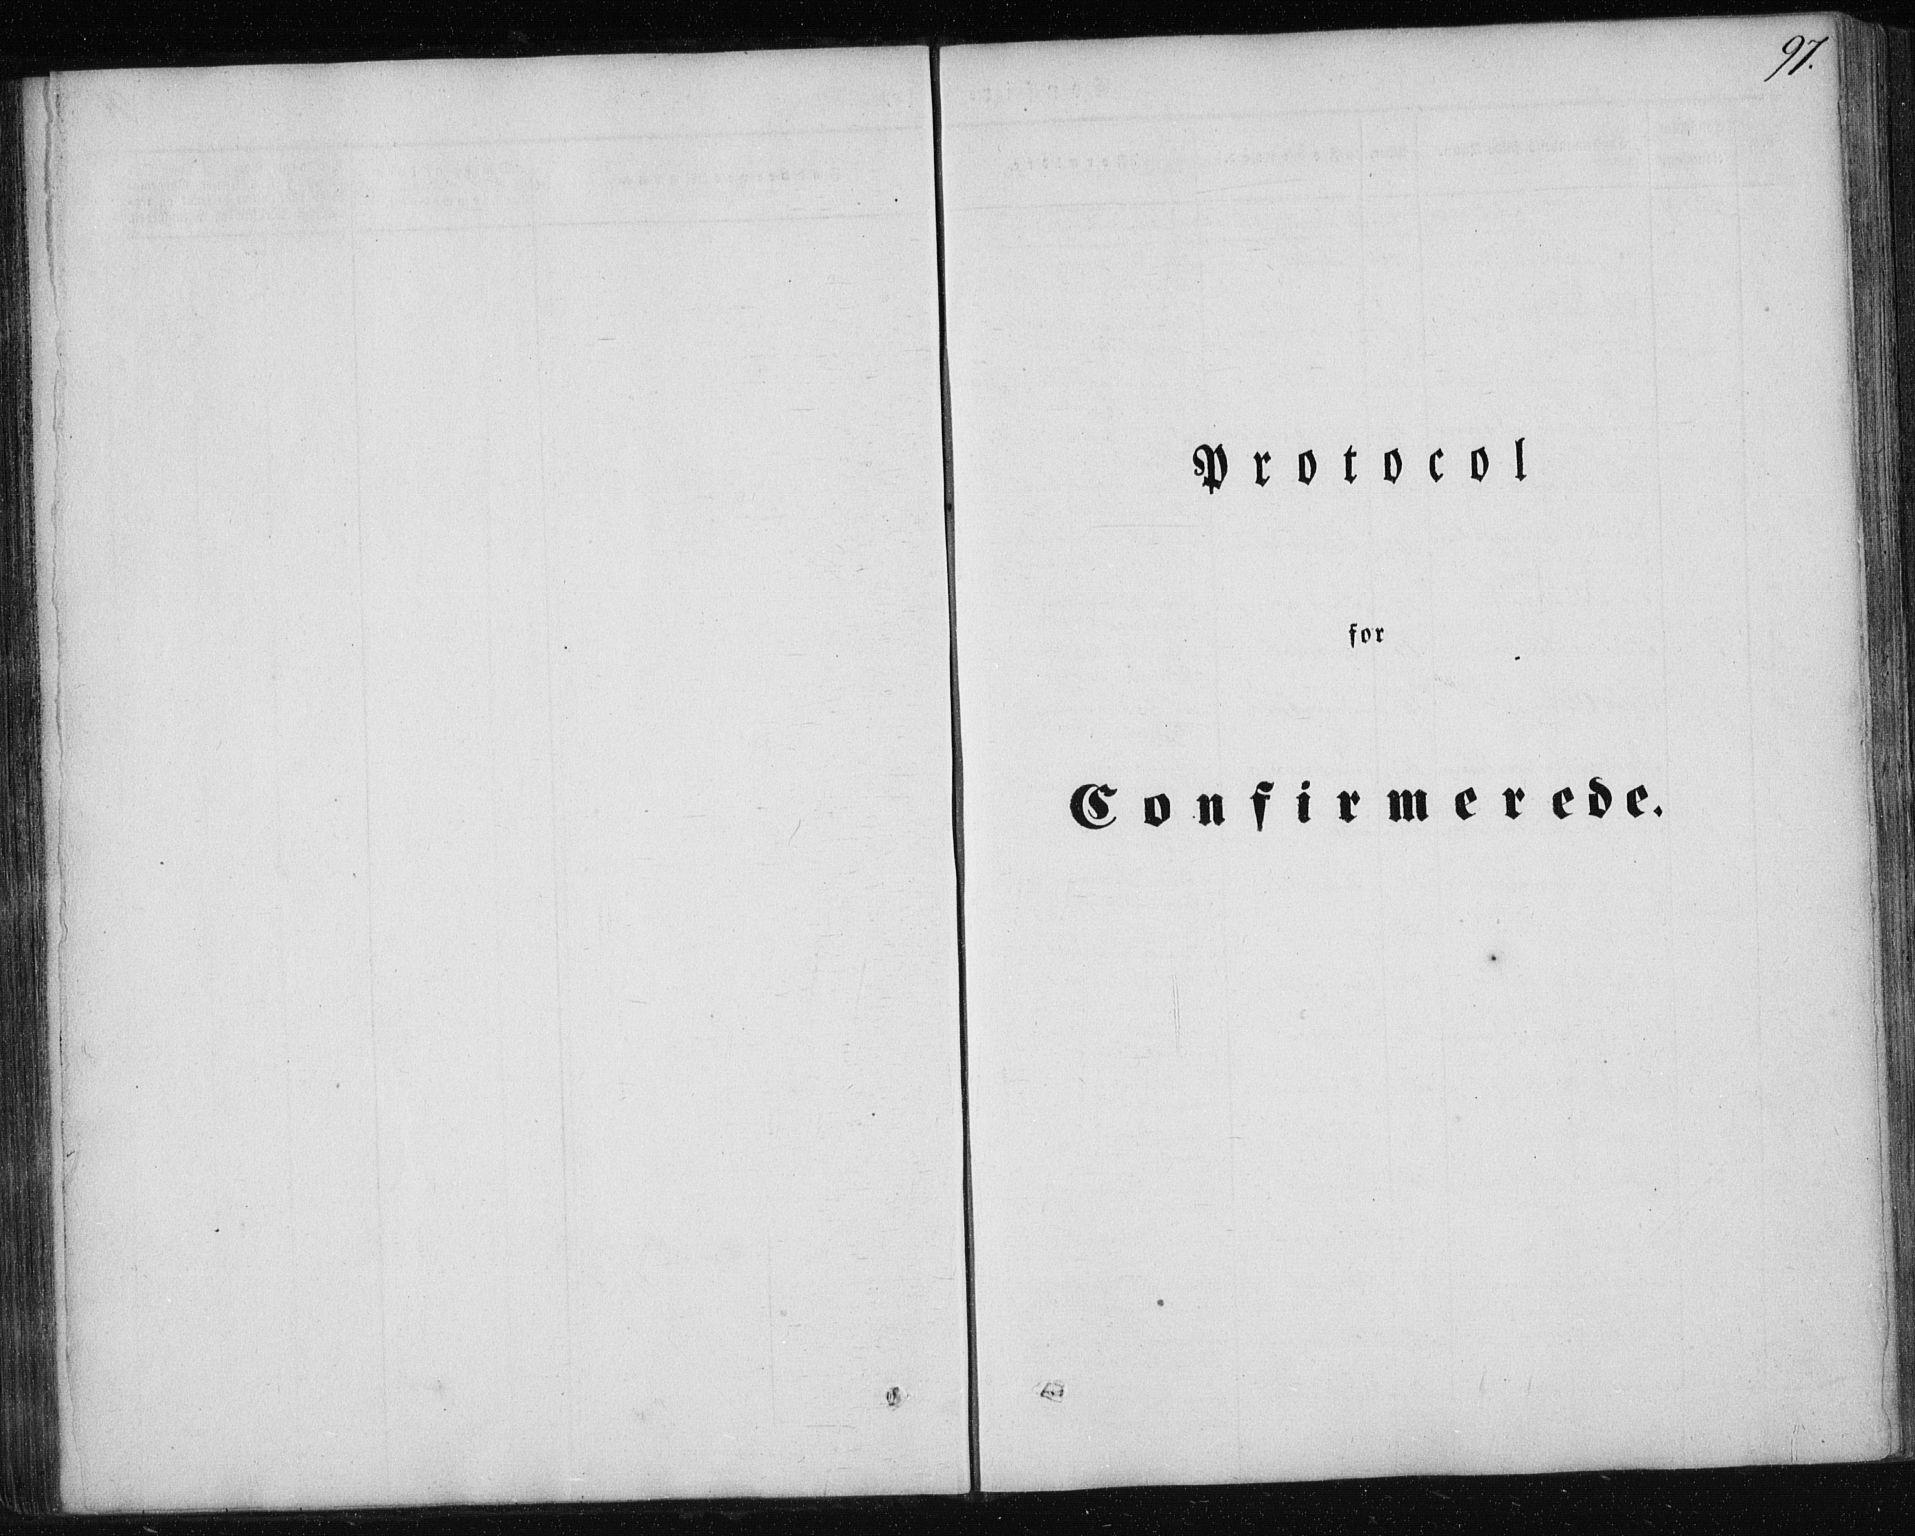 SAT, Ministerialprotokoller, klokkerbøker og fødselsregistre - Nordland, 827/L0391: Ministerialbok nr. 827A03, 1842-1852, s. 97